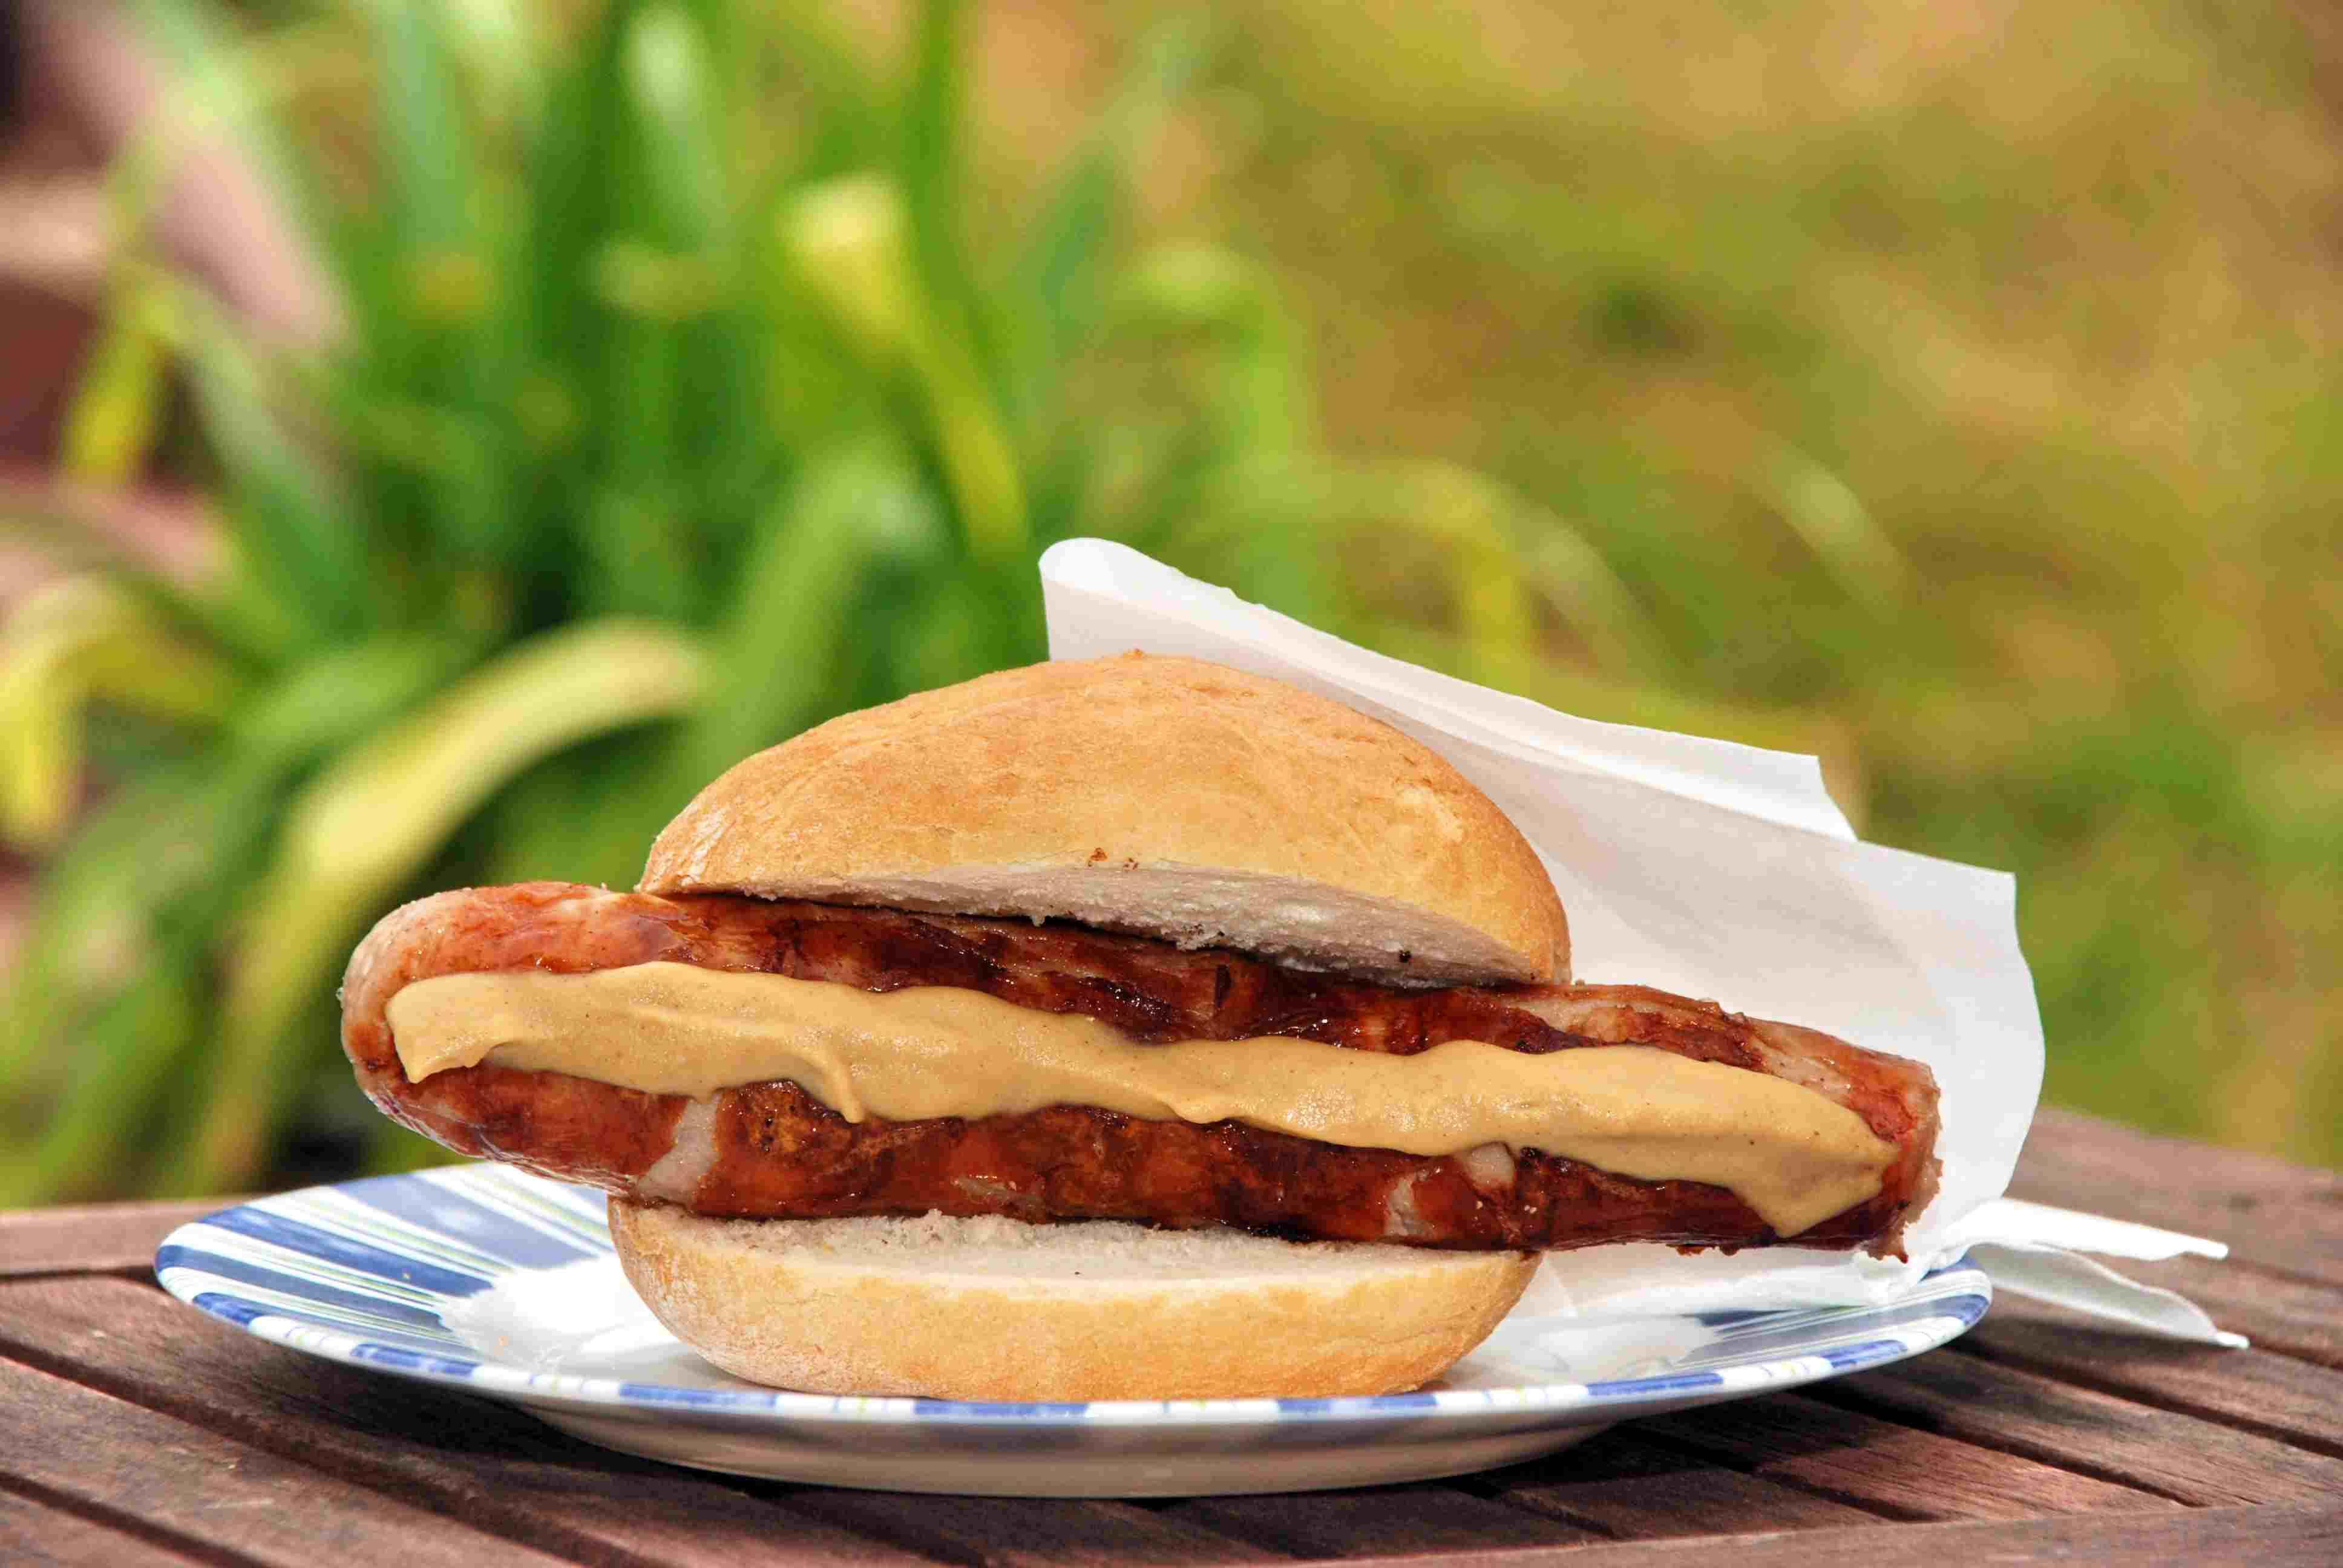 Knackwurst/Knockwurst with mustard on bun